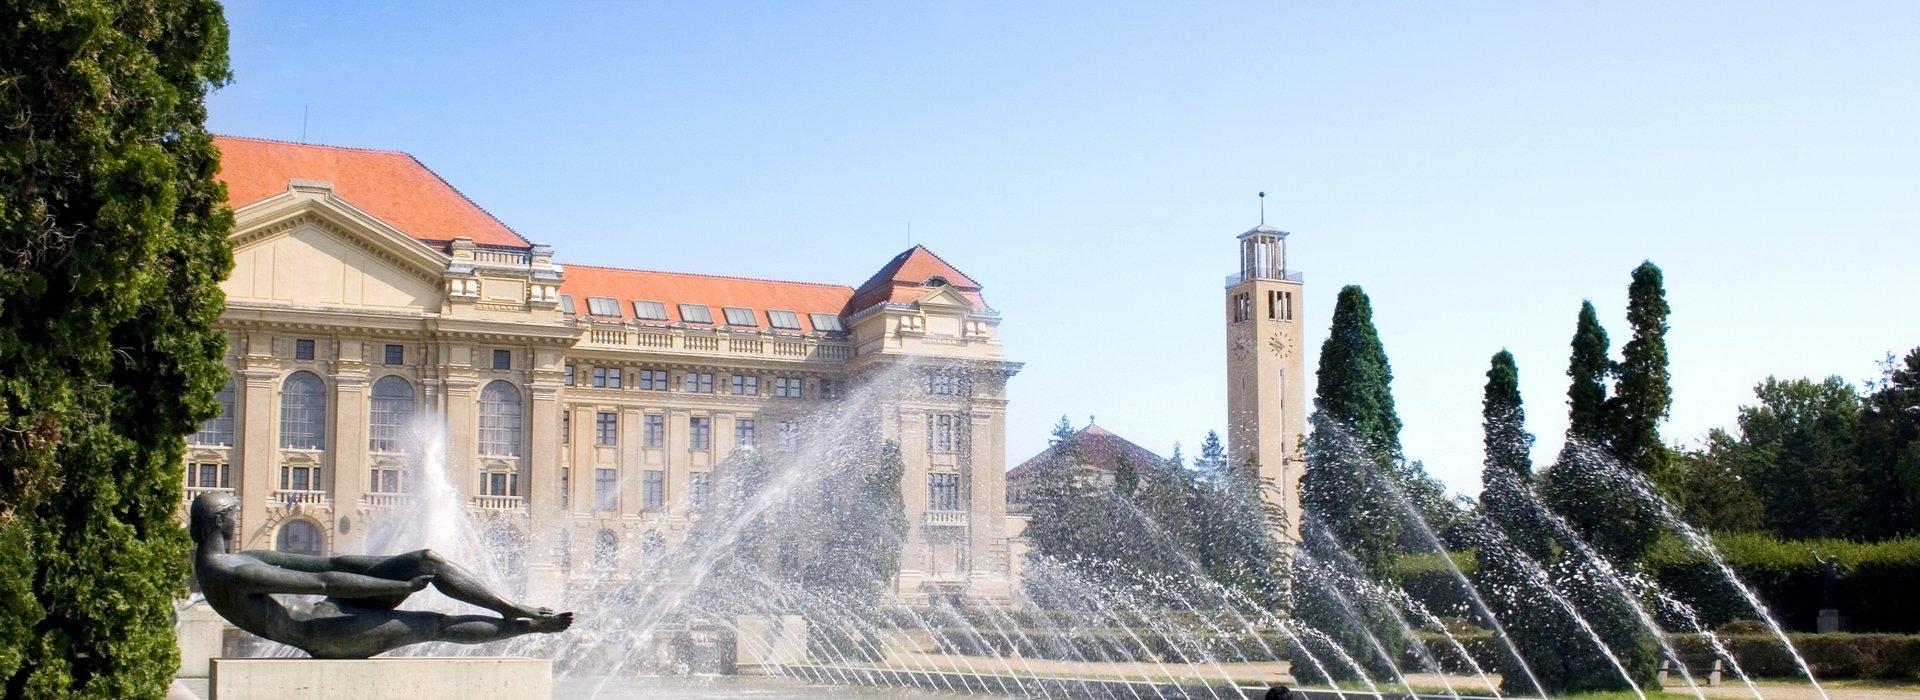 Debrecen Unterkünfte - Hotels, Pensionen, Appartements